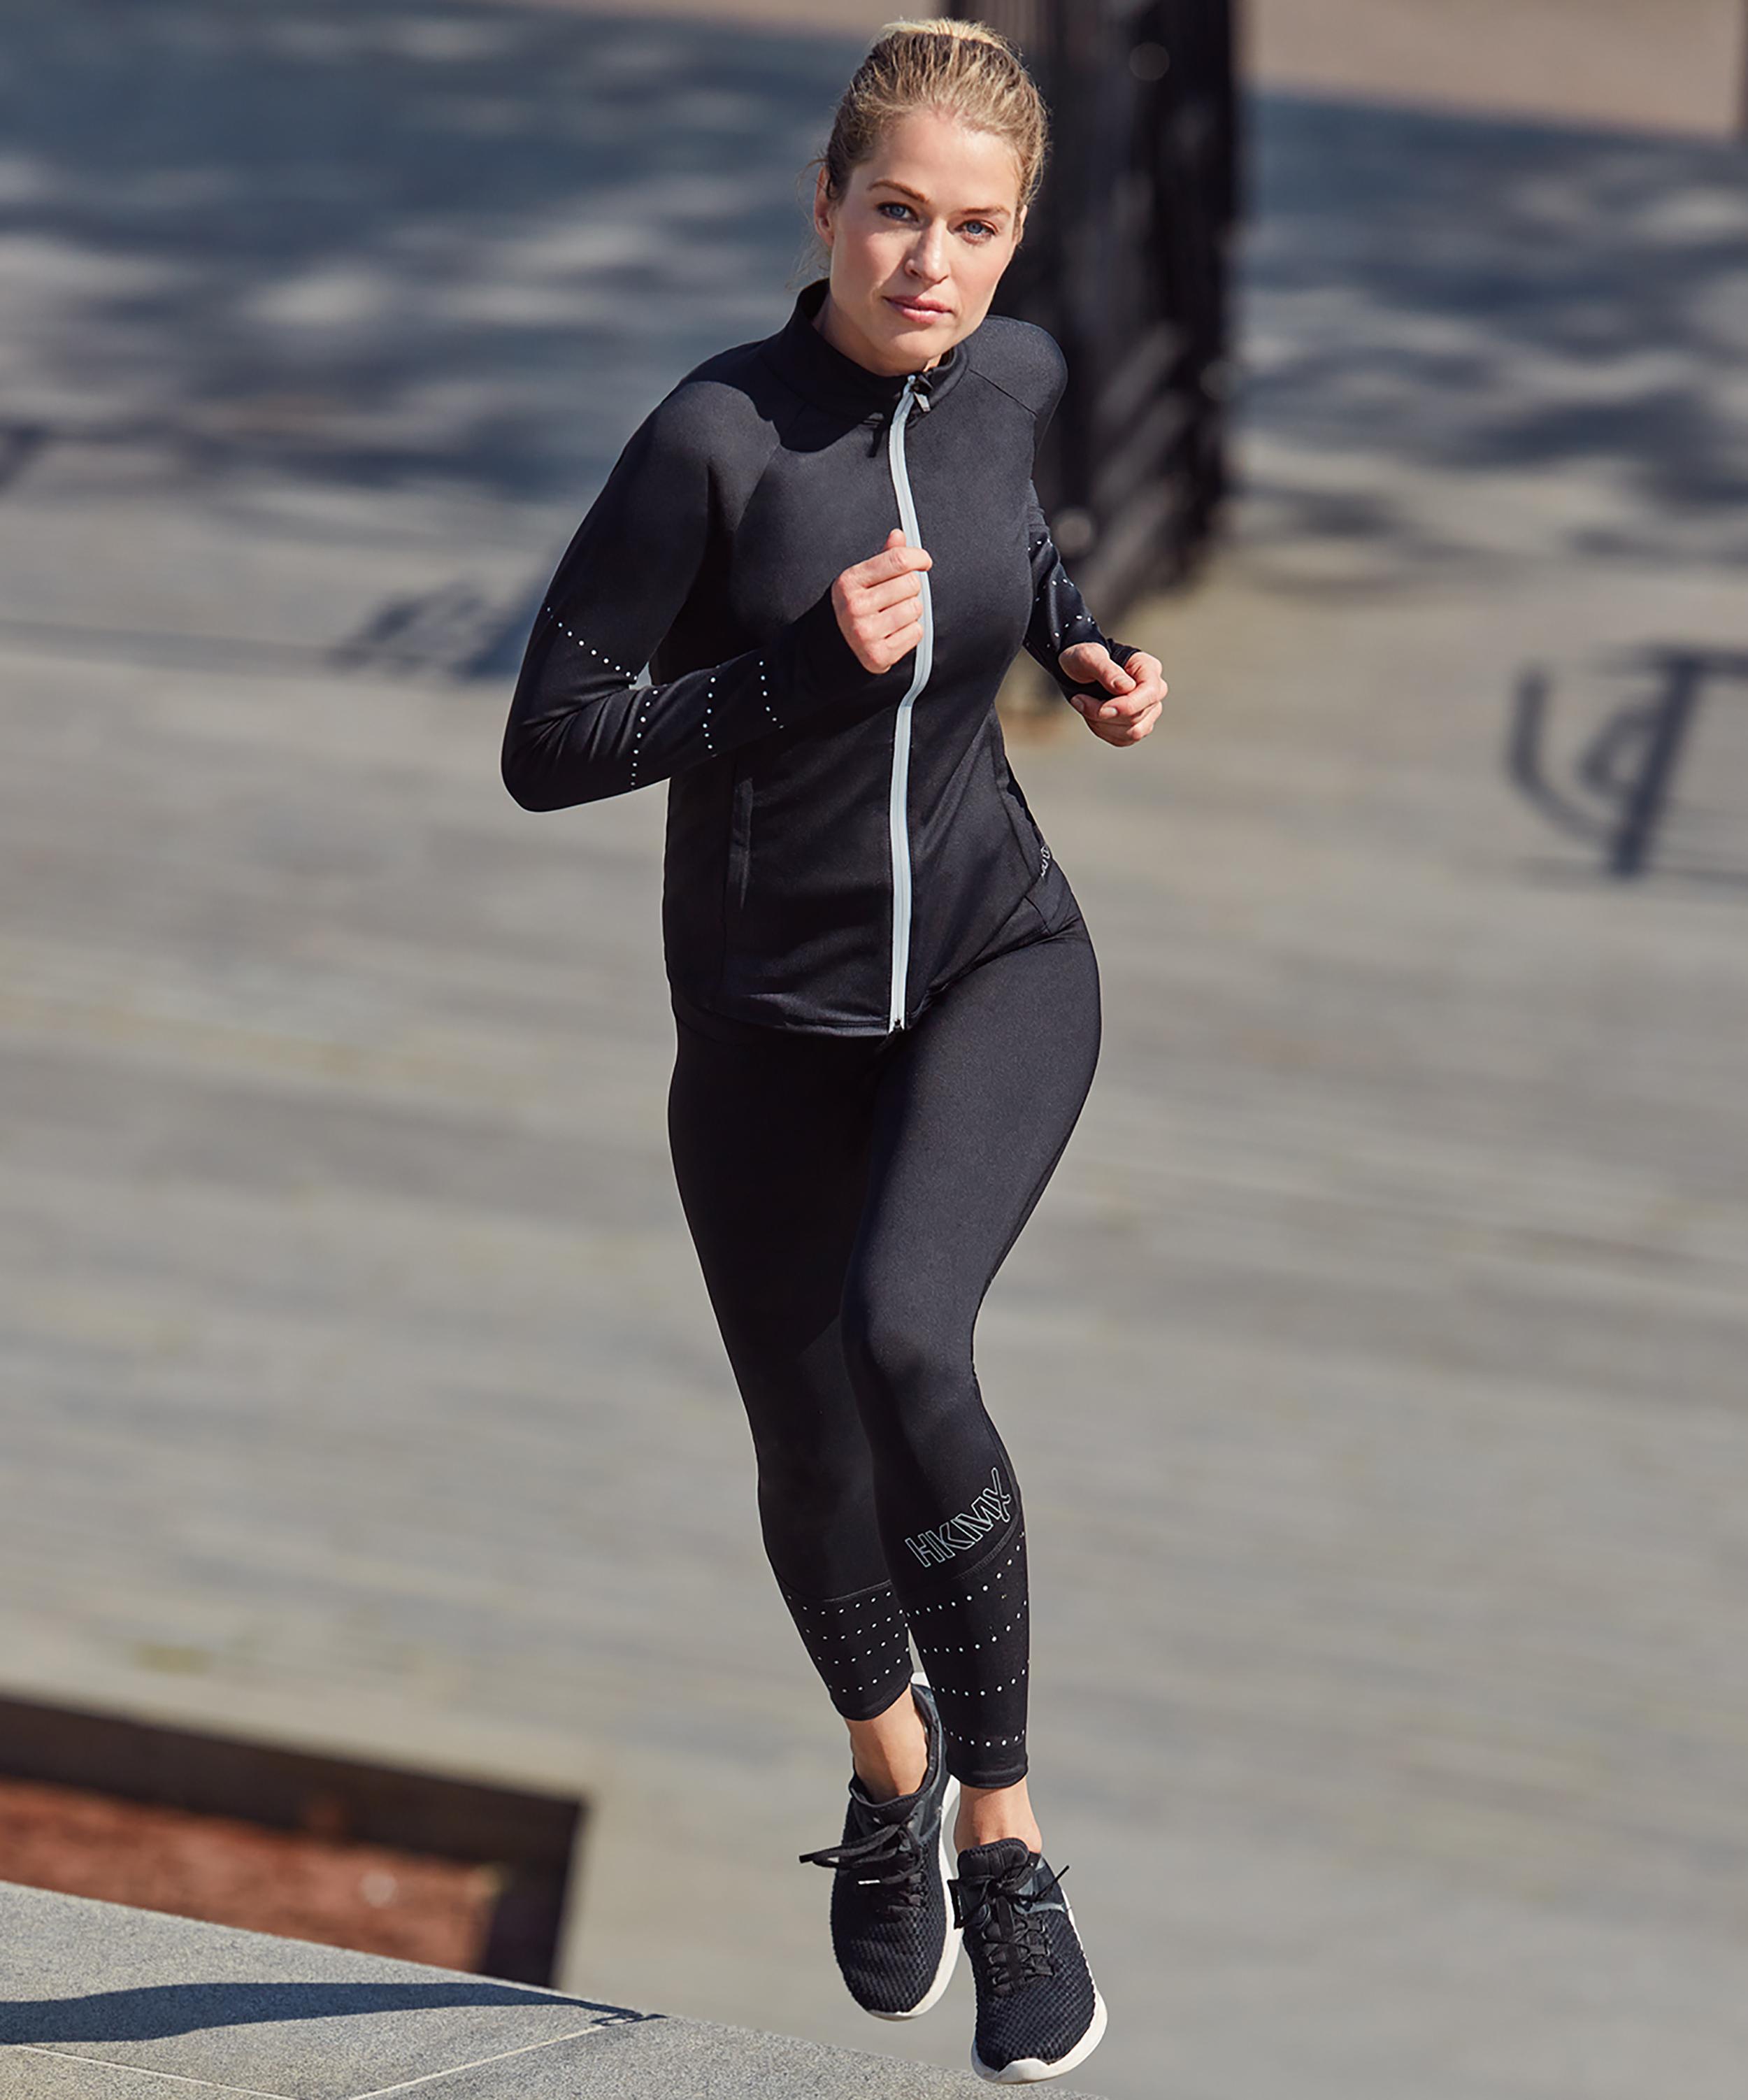 HKMX Run Baby Run Regular Waist Legging, Schwarz, main